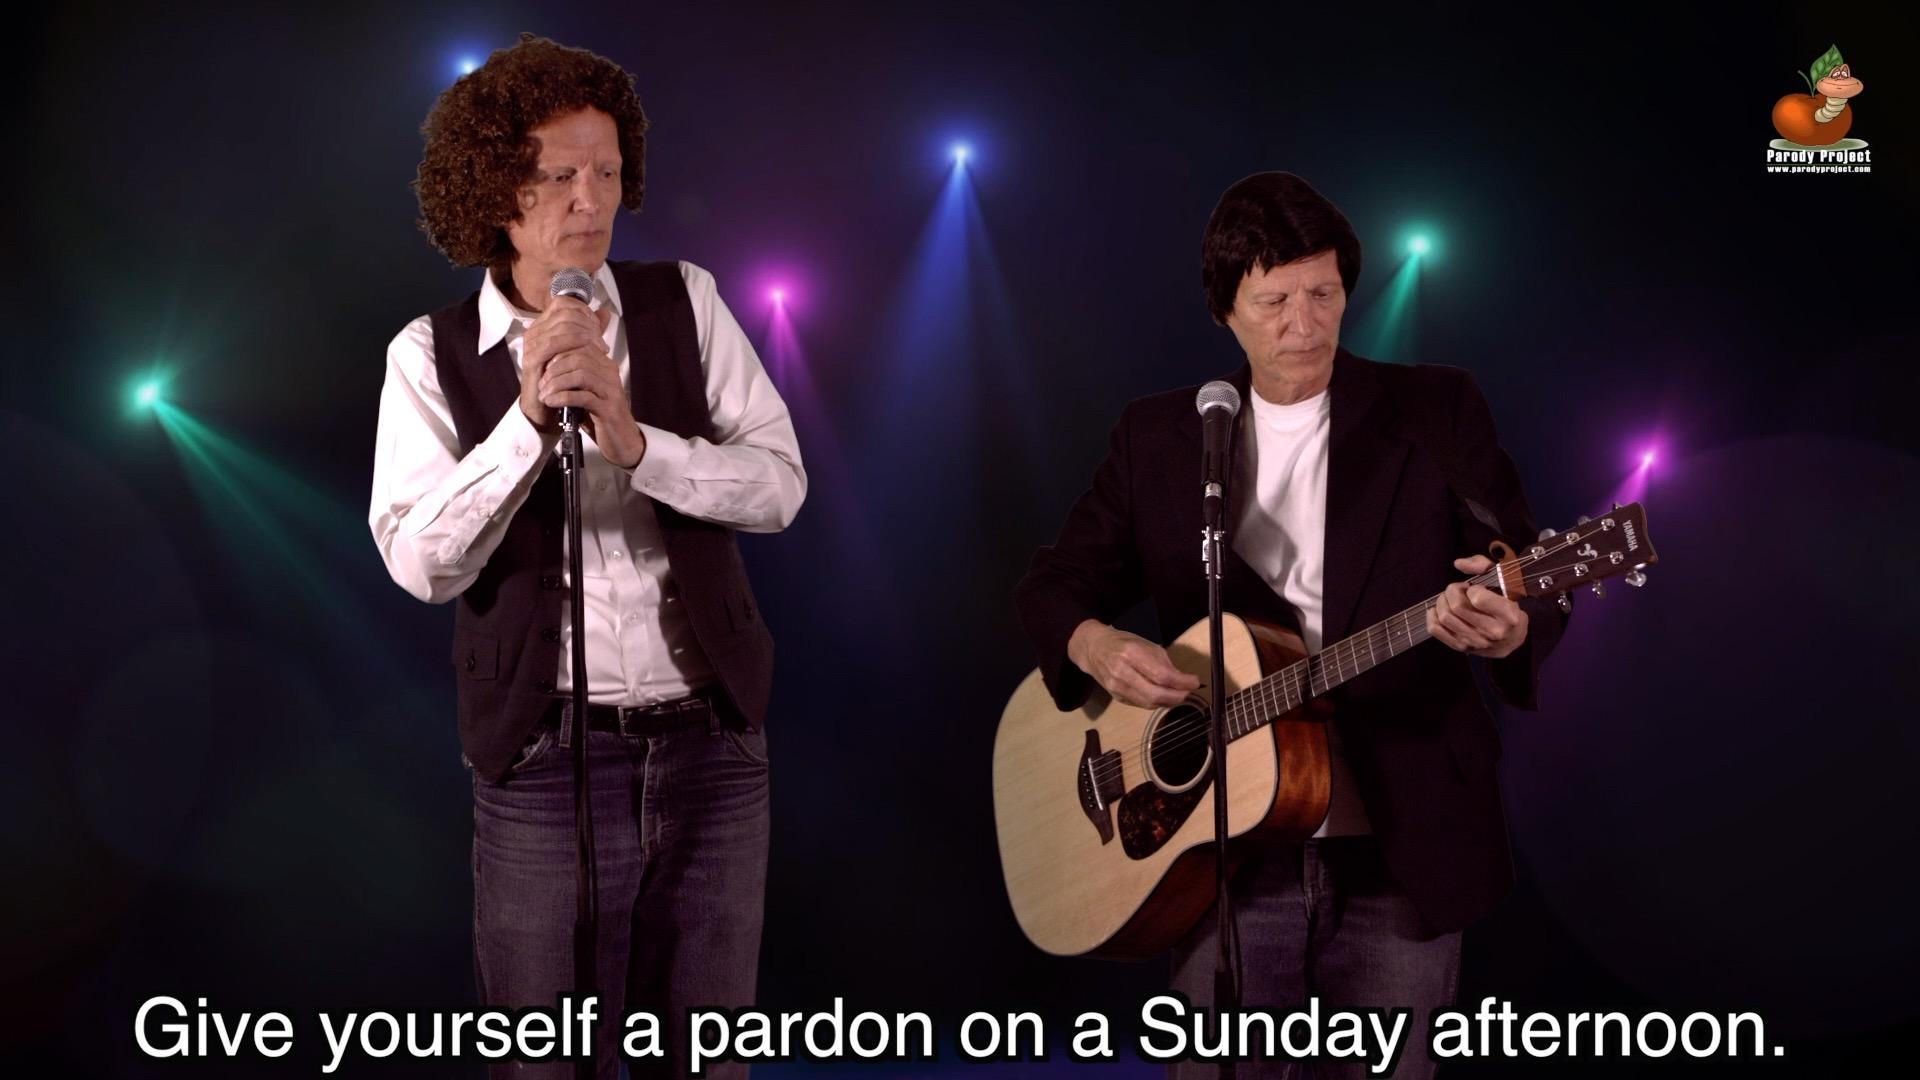 MR FORTY-FIVE (Parody of) Mrs. Robinson – Simon and Garfunkel